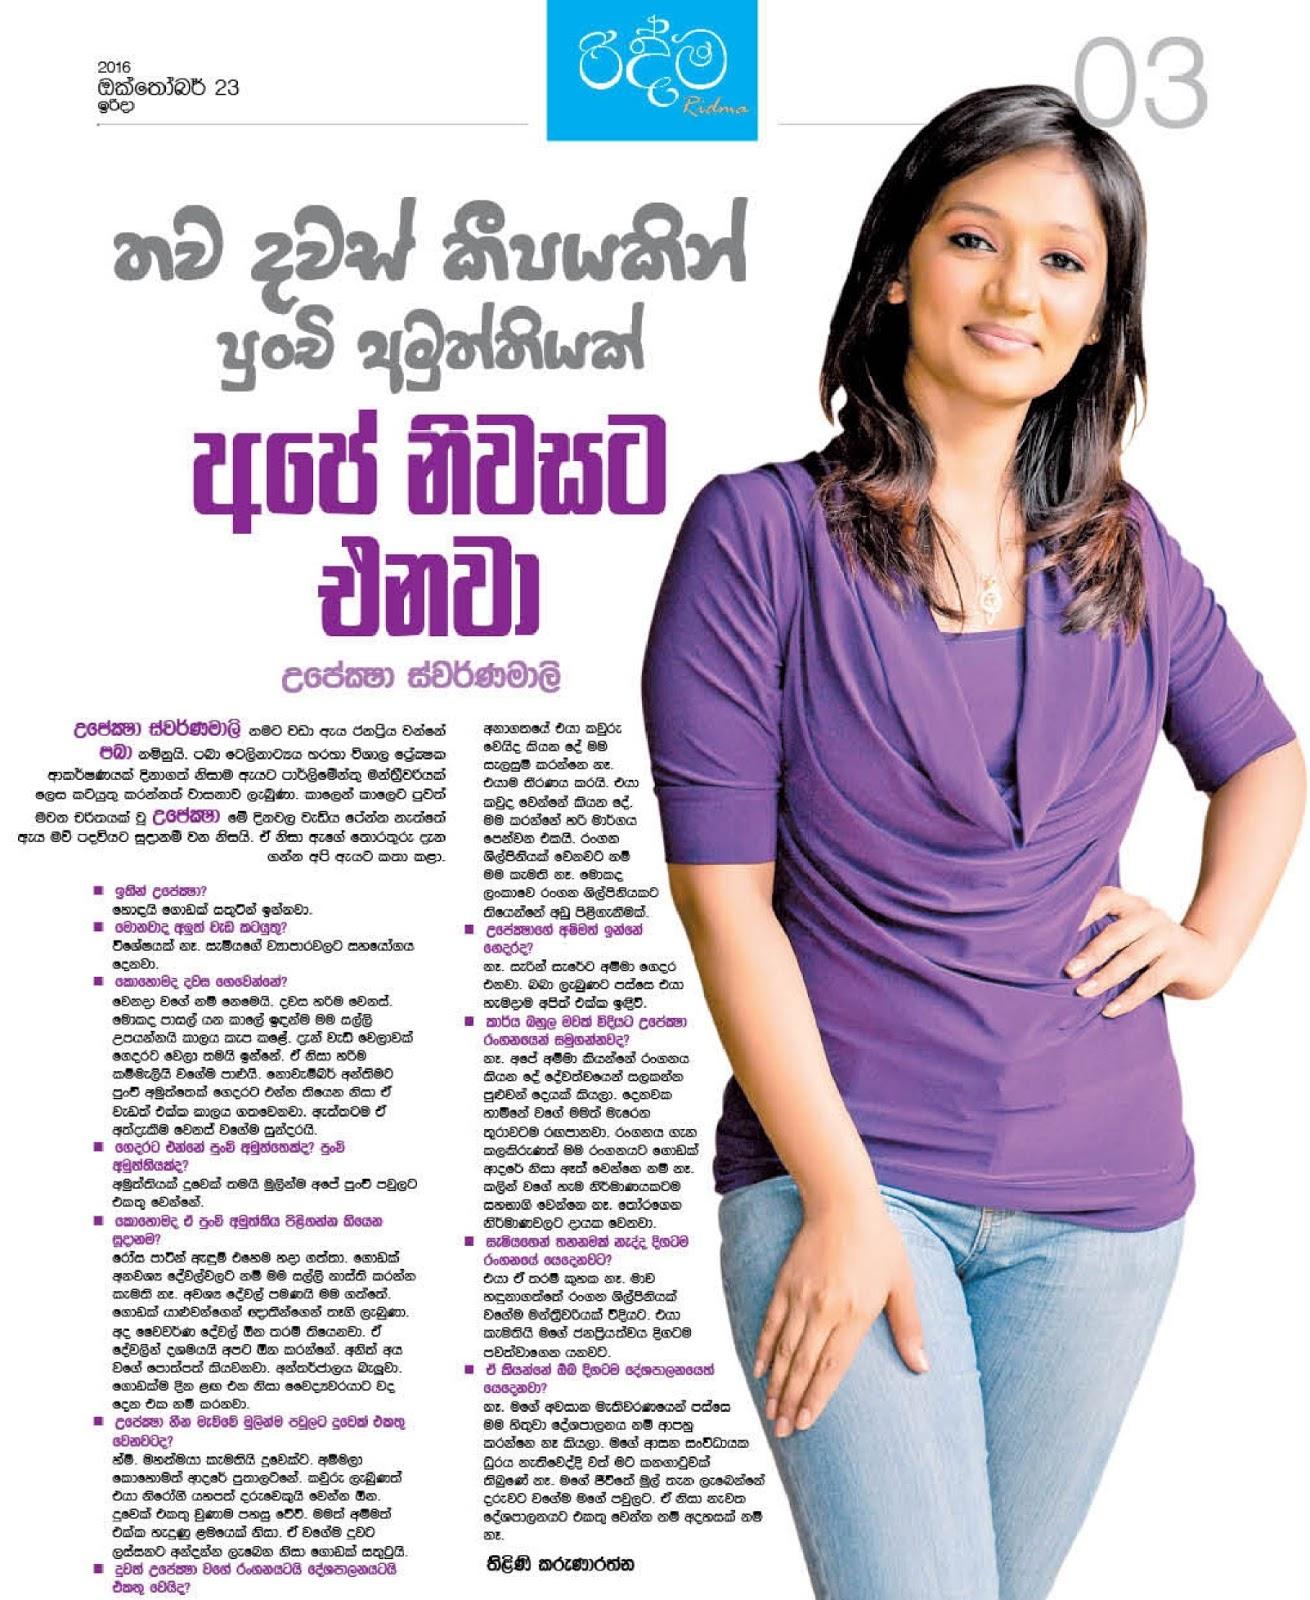 Chat With Paba Upeksha Swarnamali